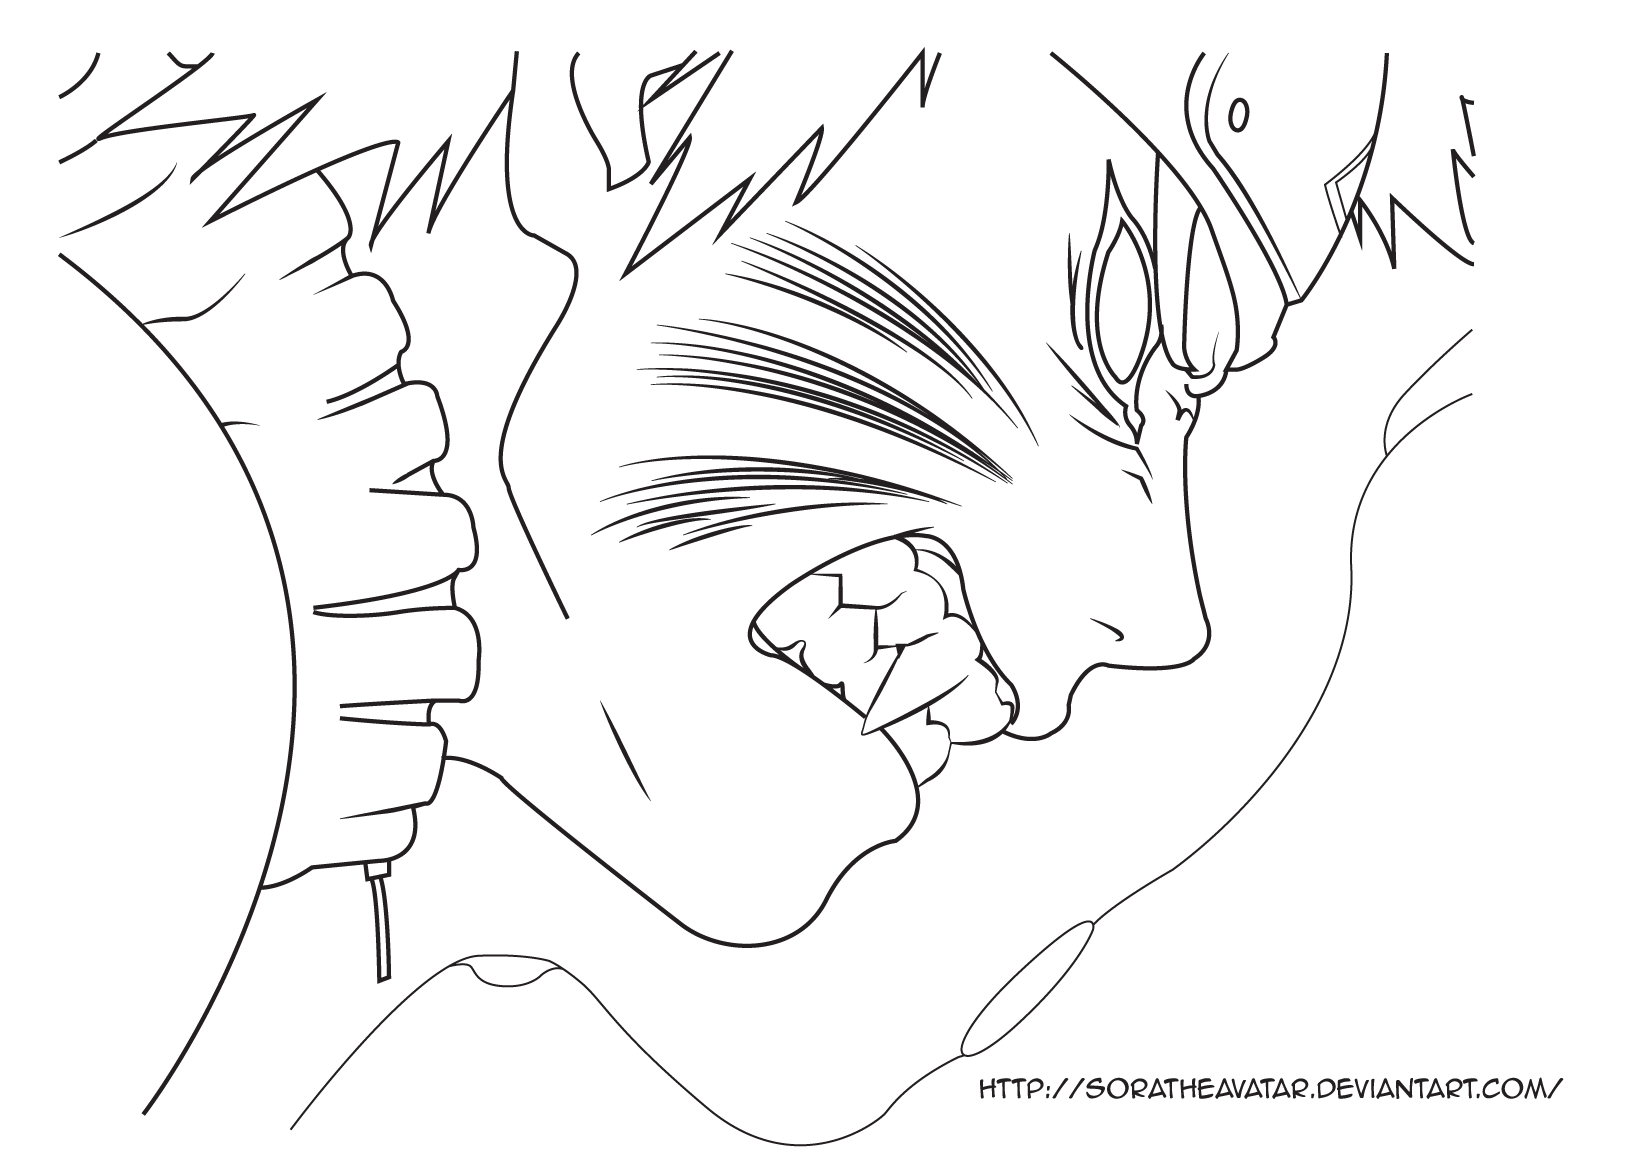 Naruto Lineart : Kyuubi naruto line art by soratheavatar on deviantart